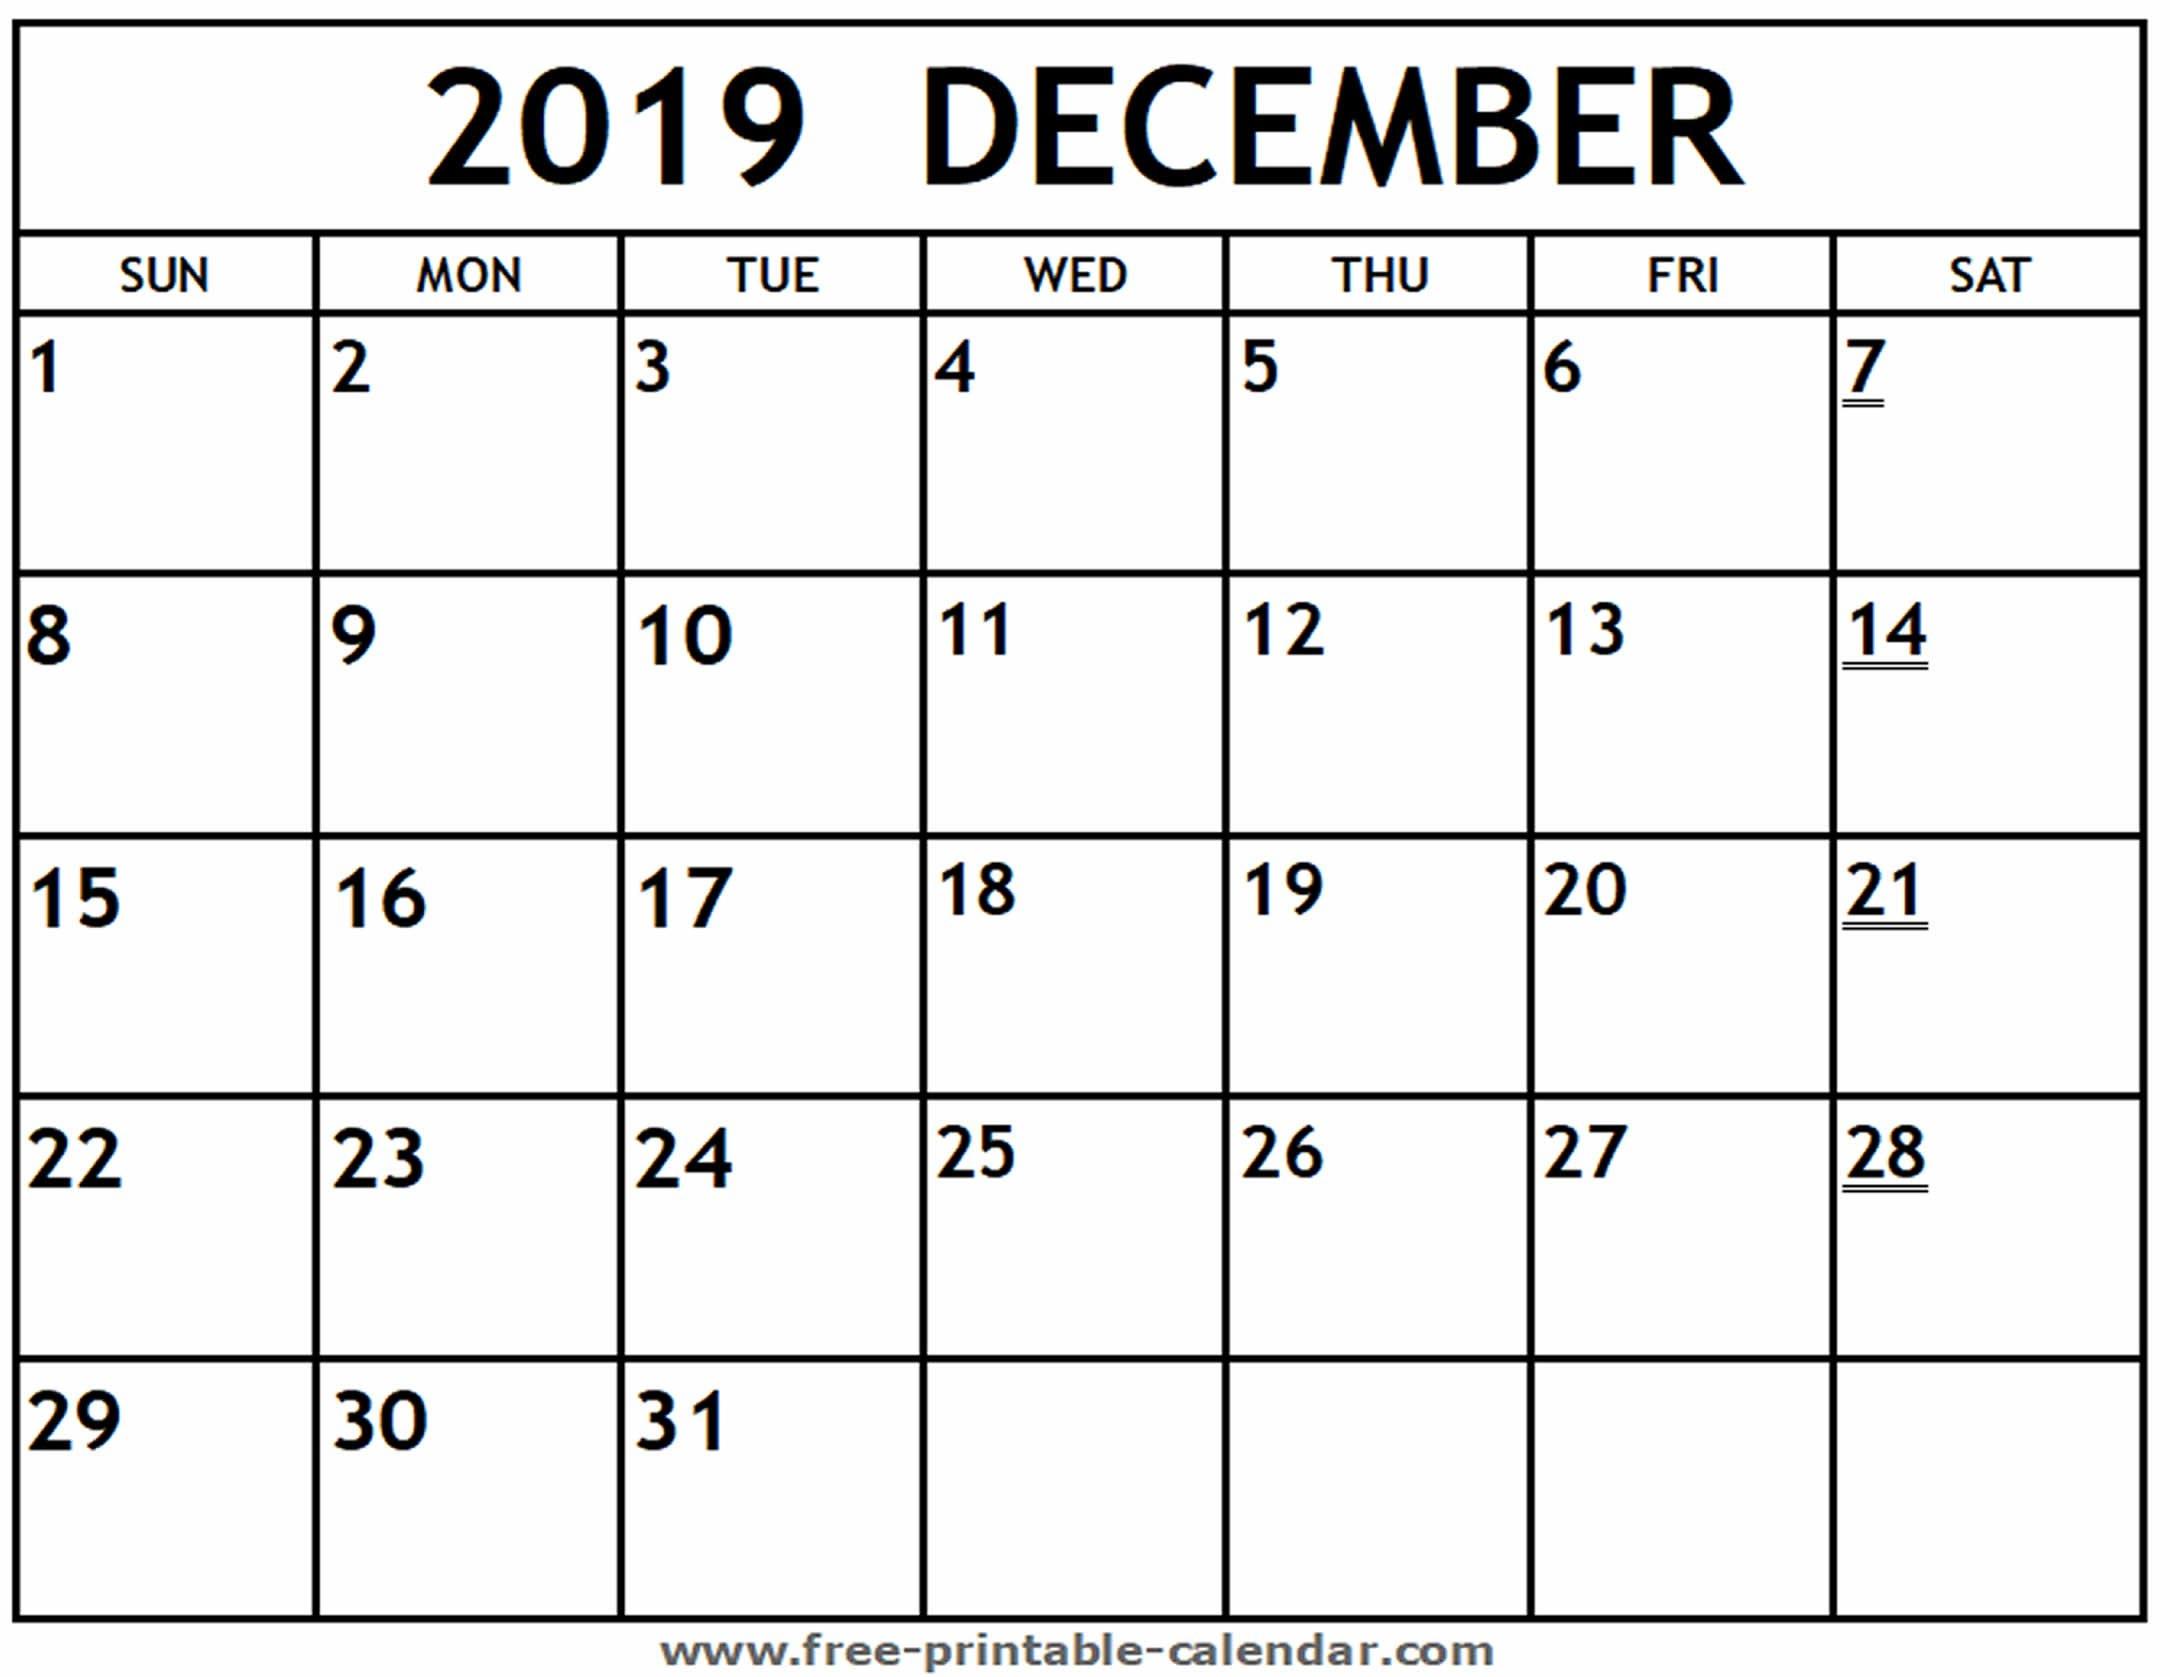 Printable 2019 December Calendar – Free-Printable-Calendar Calendar 2019 December Printable